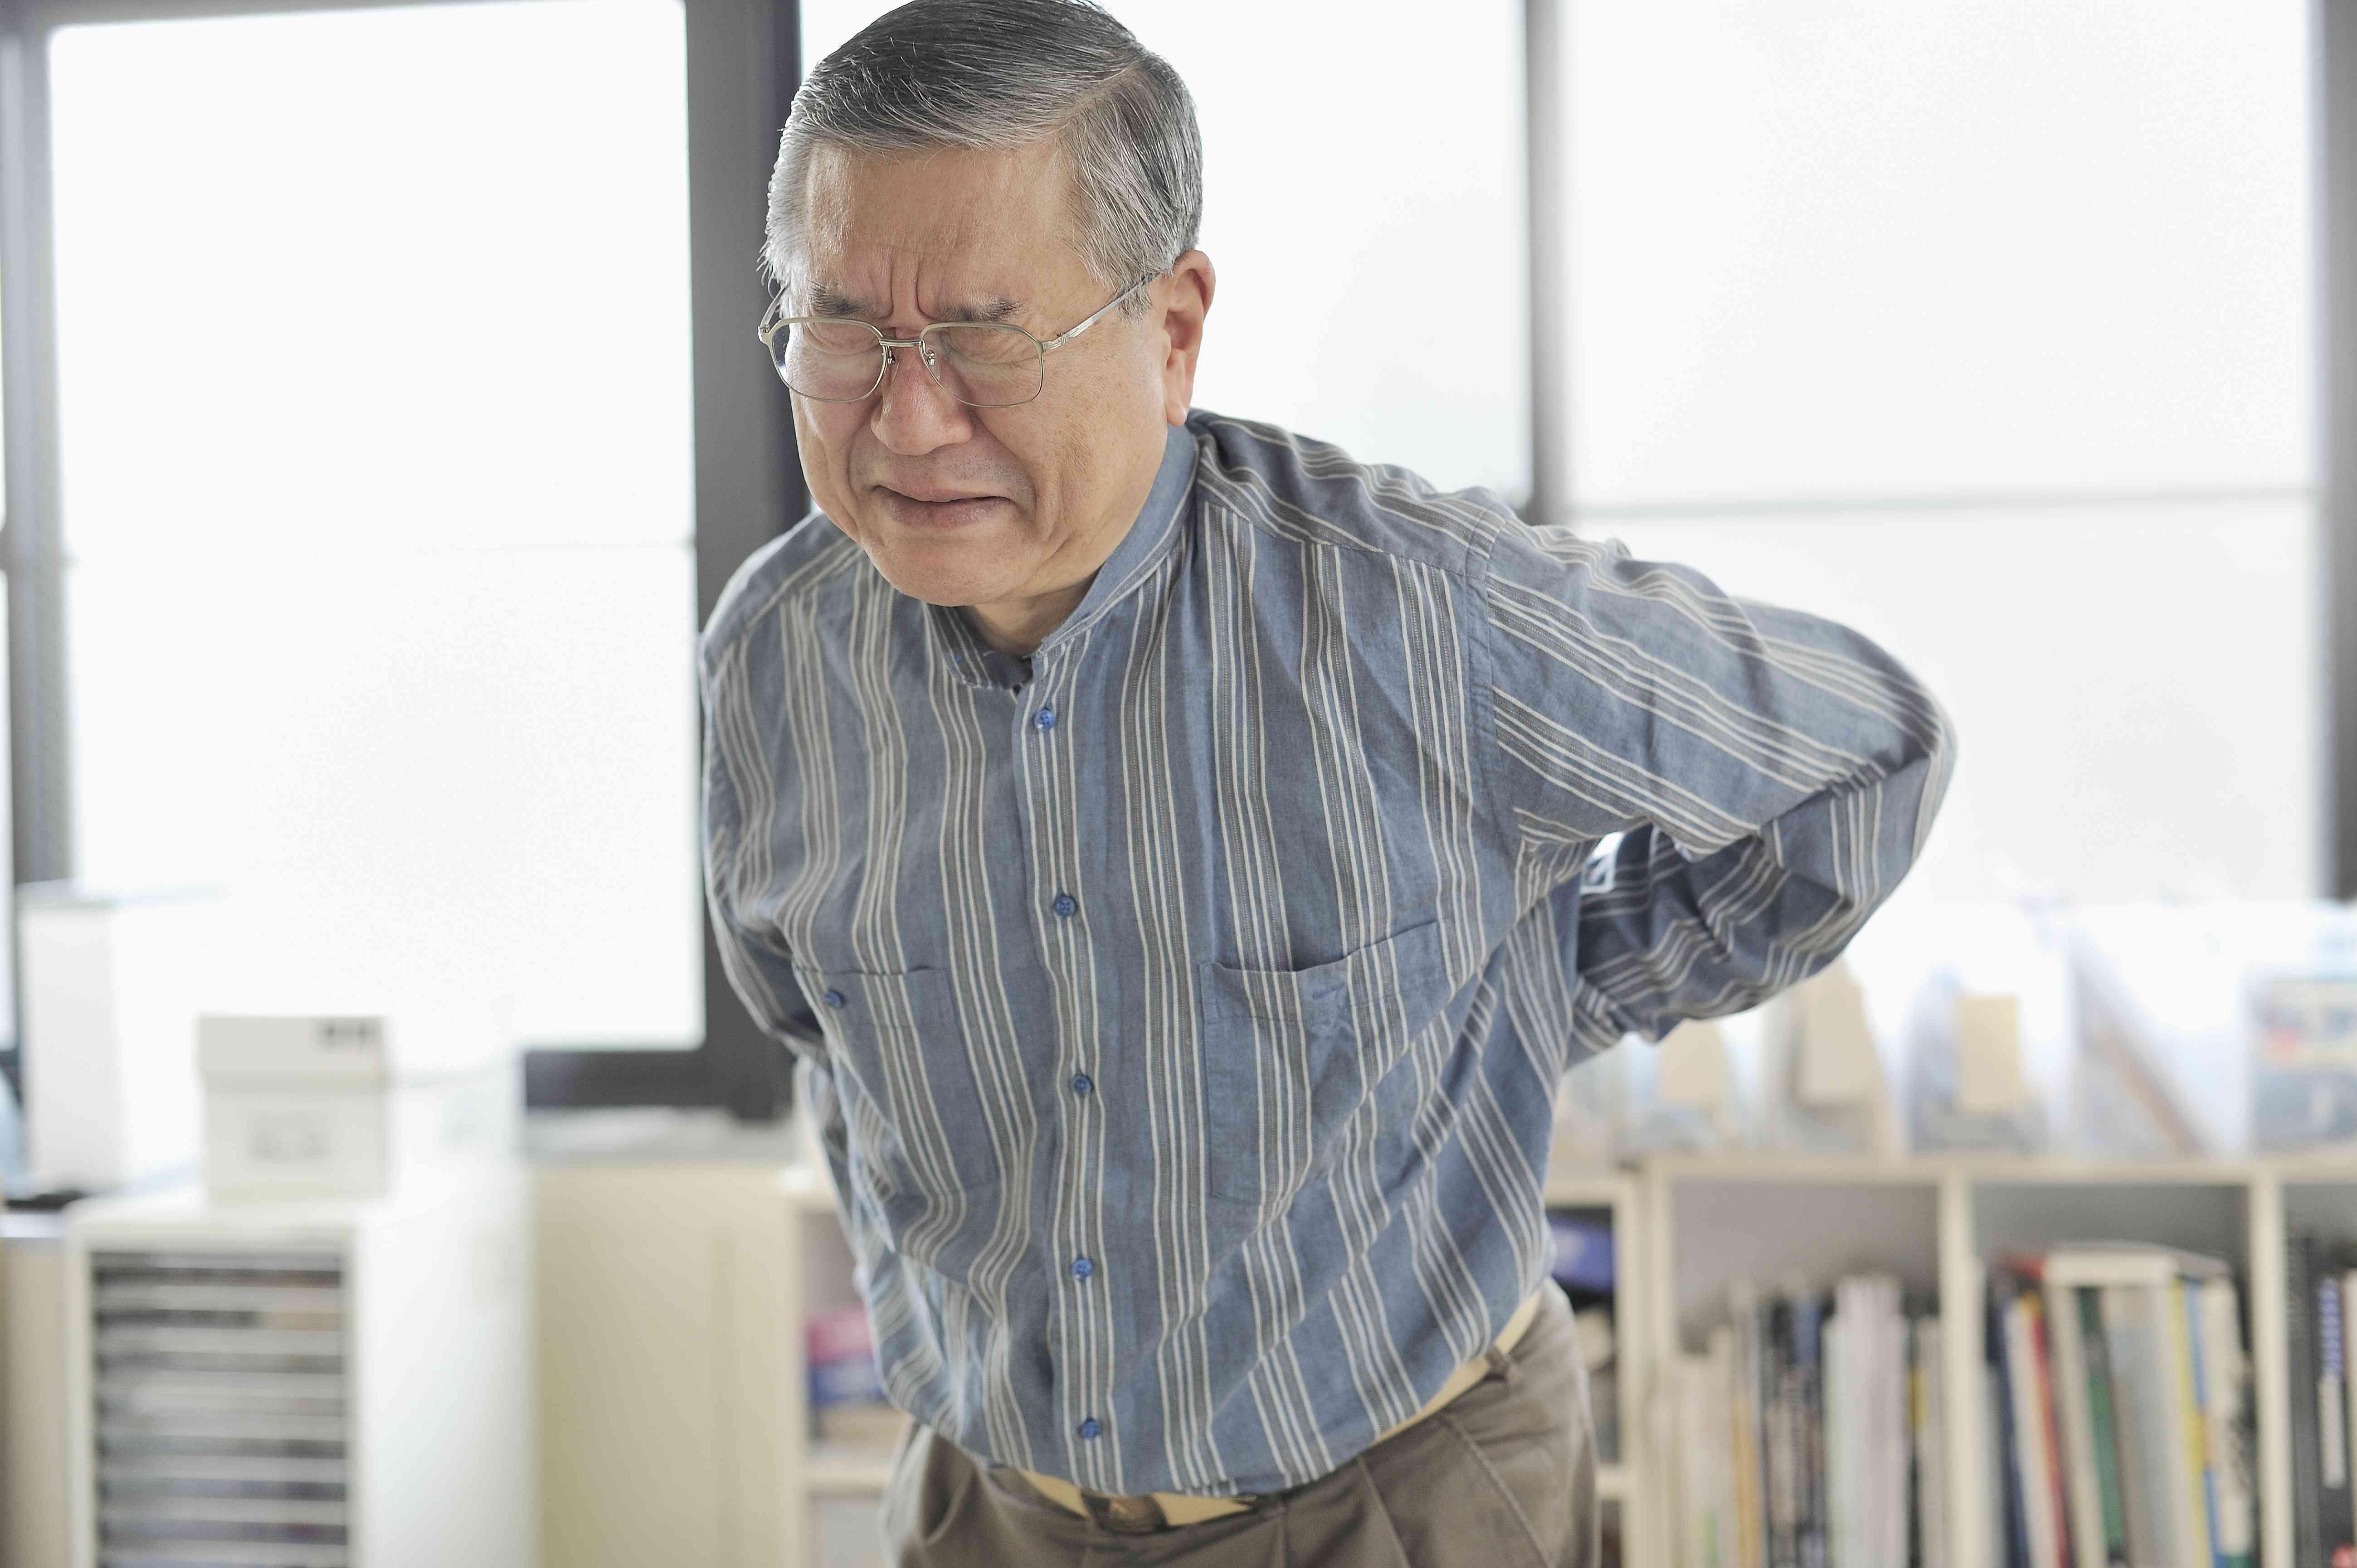 Man in lower back pain in an office